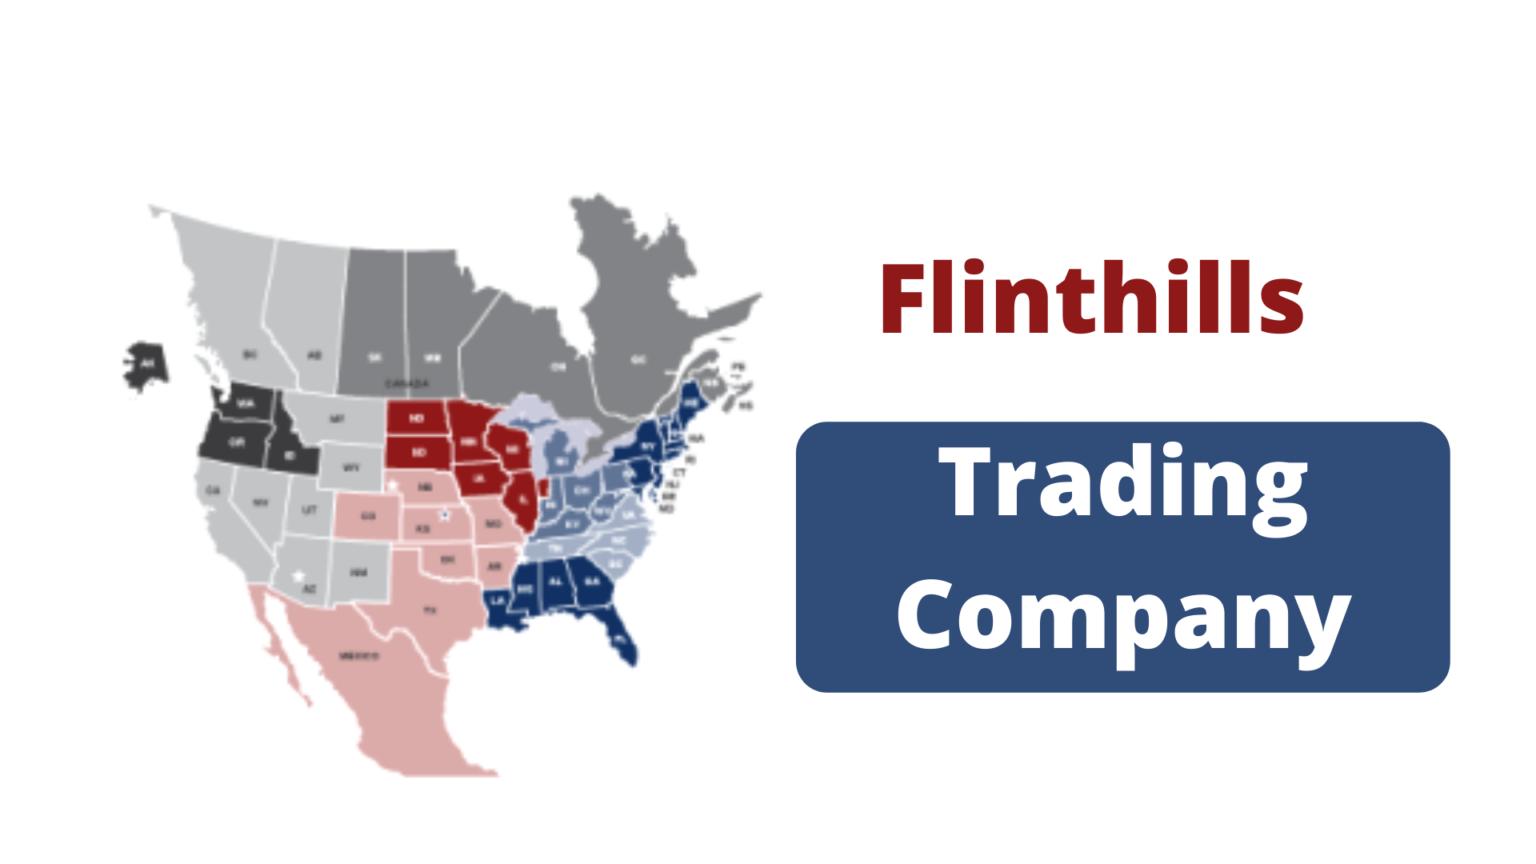 Flinthills Trading Company